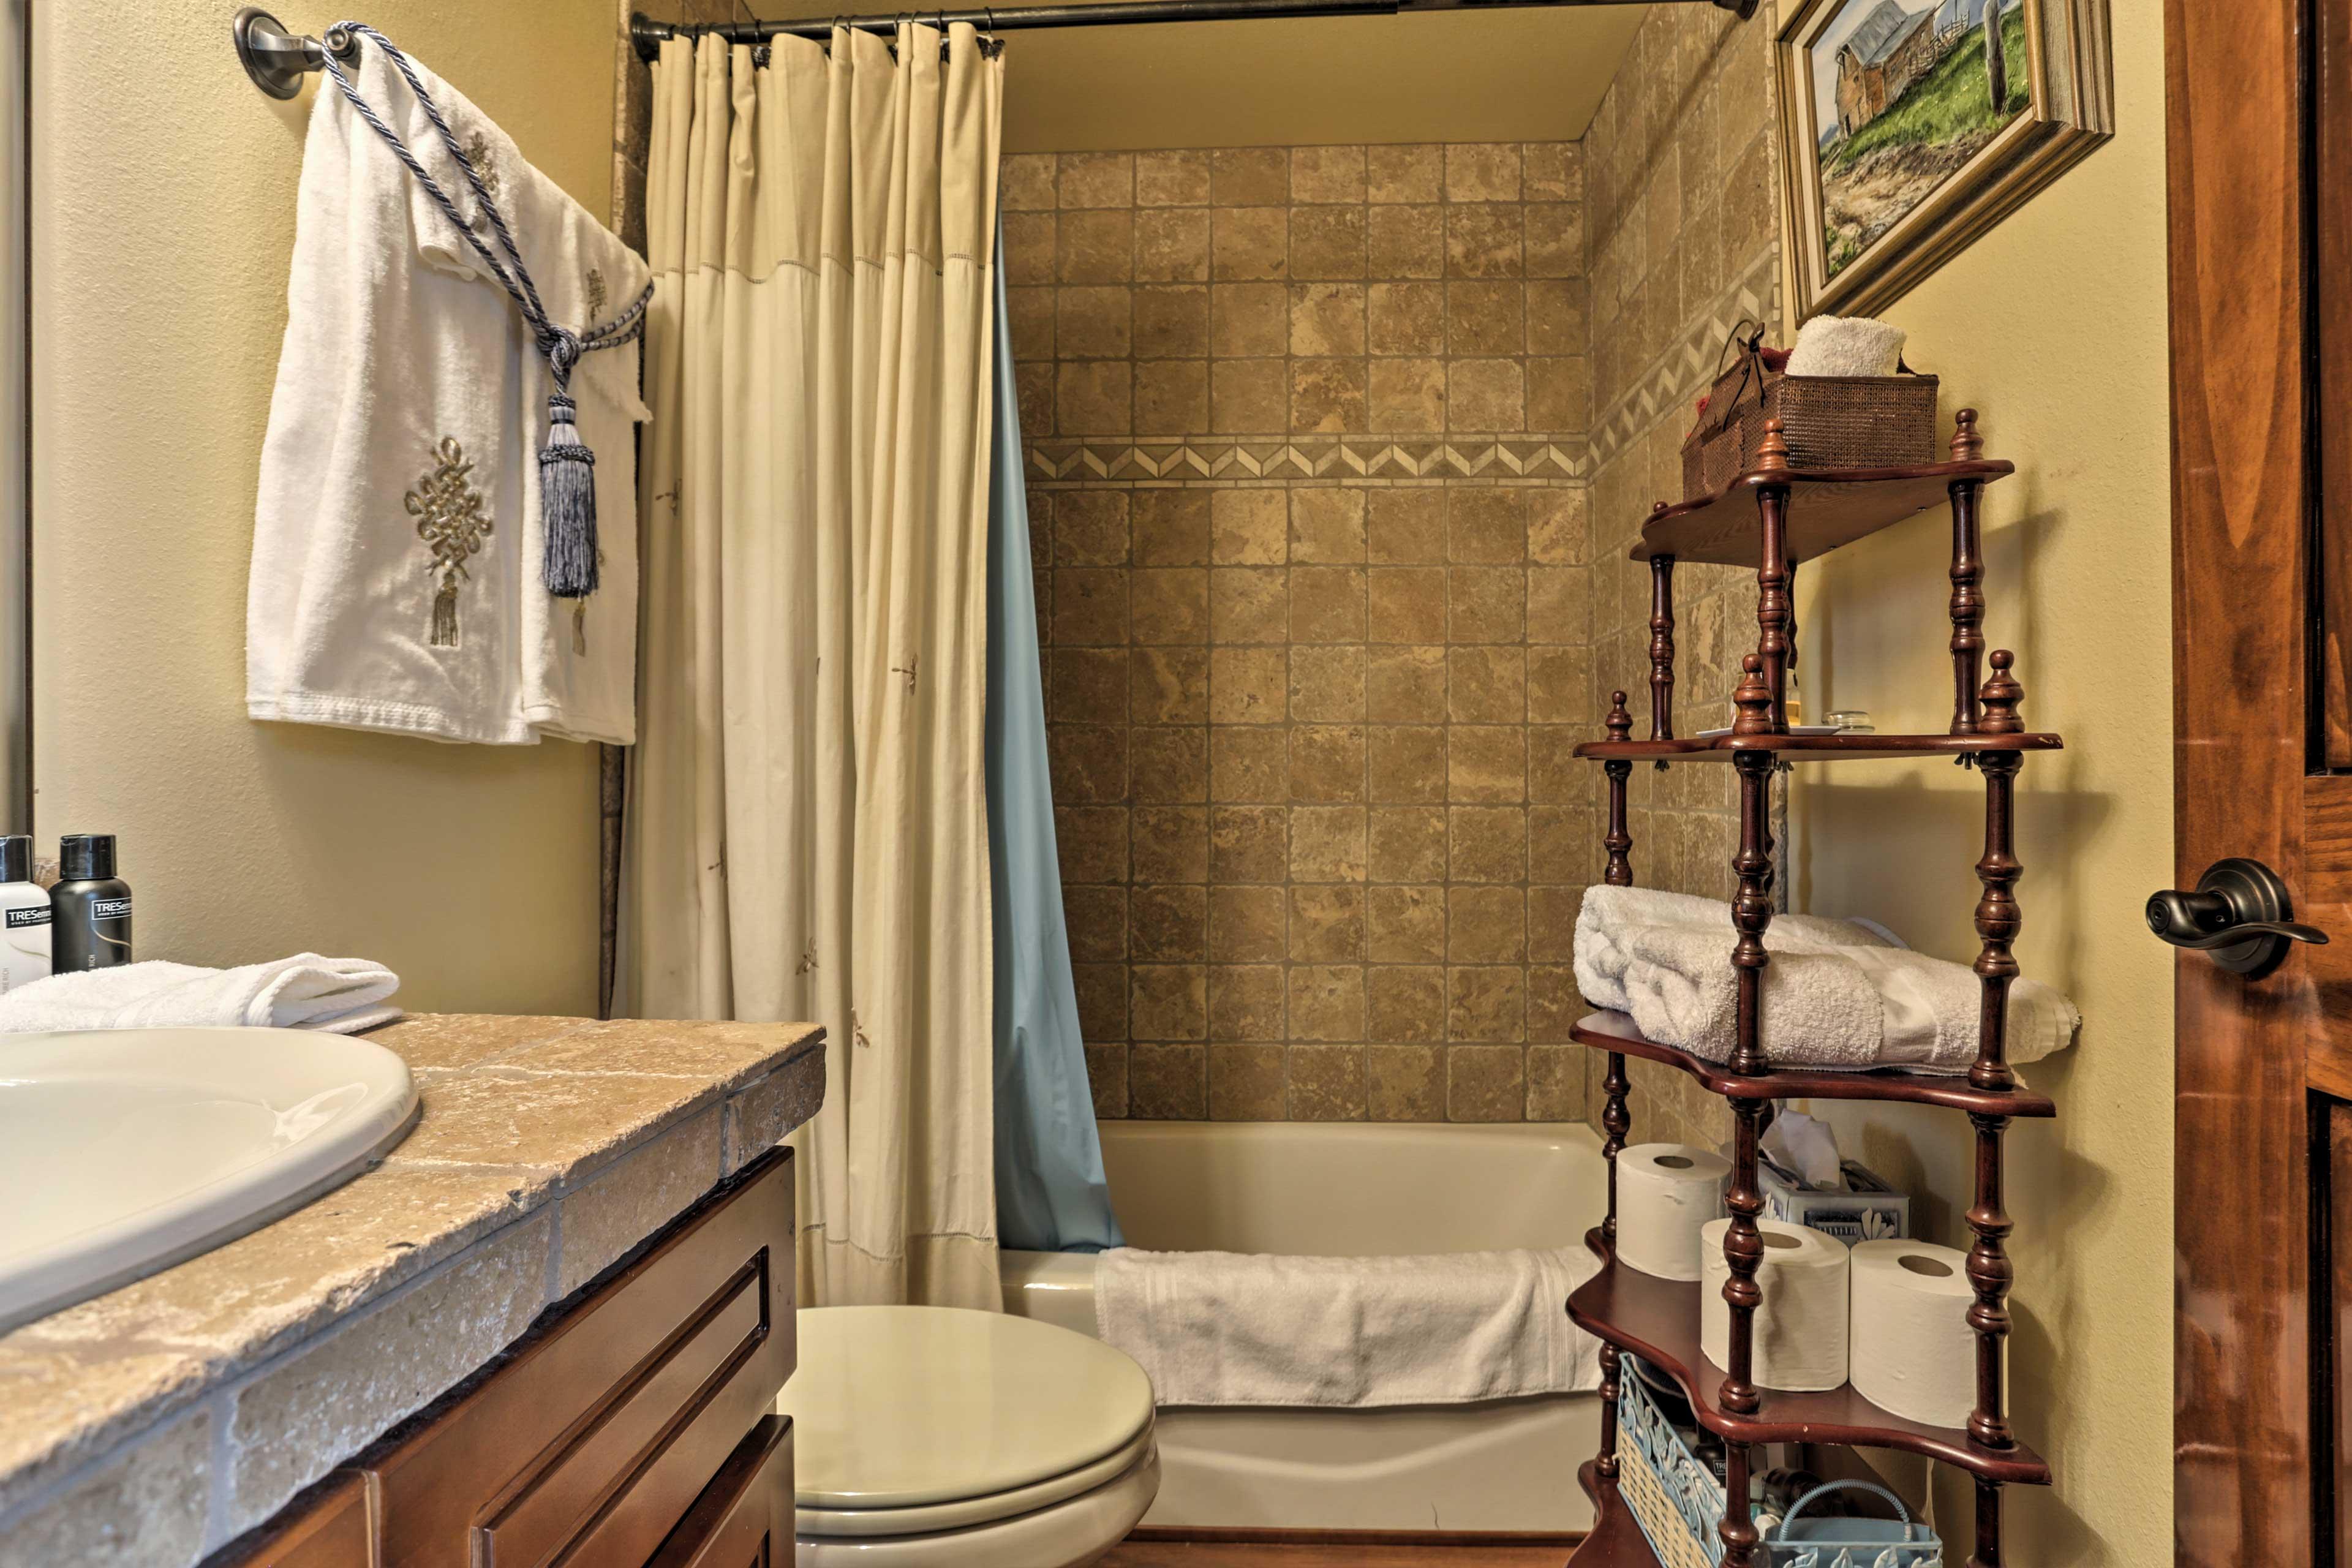 Not feeling like a shower? Draw yourself a hot bubble bath.